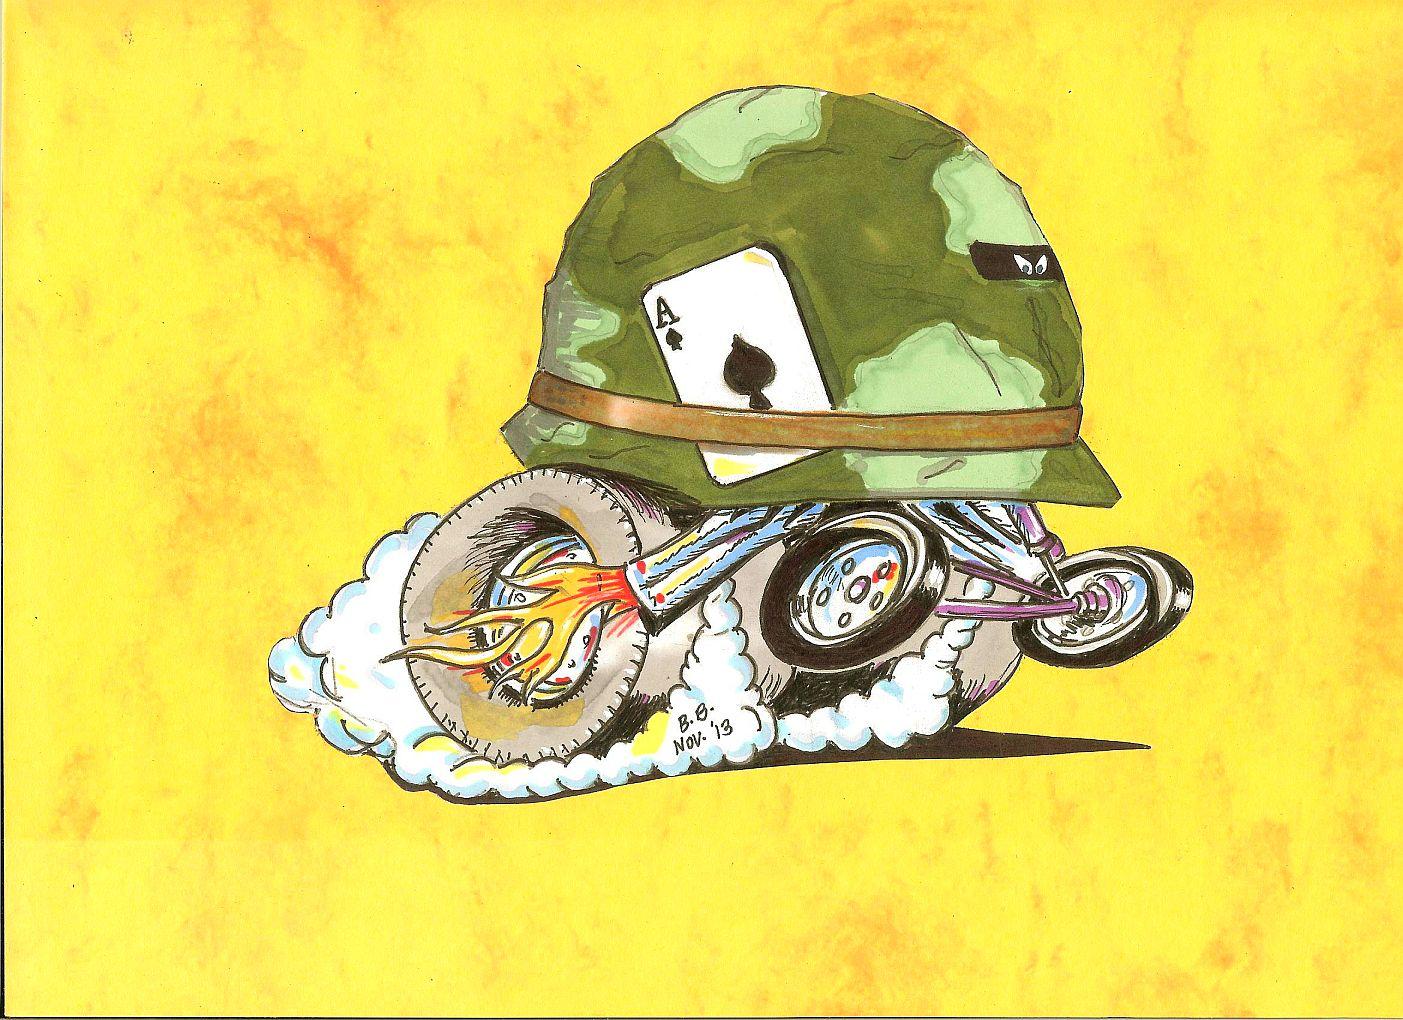 Click image for larger version  Name:helmet hot rod.jpg Views:1341 Size:243.9 KB ID:97202